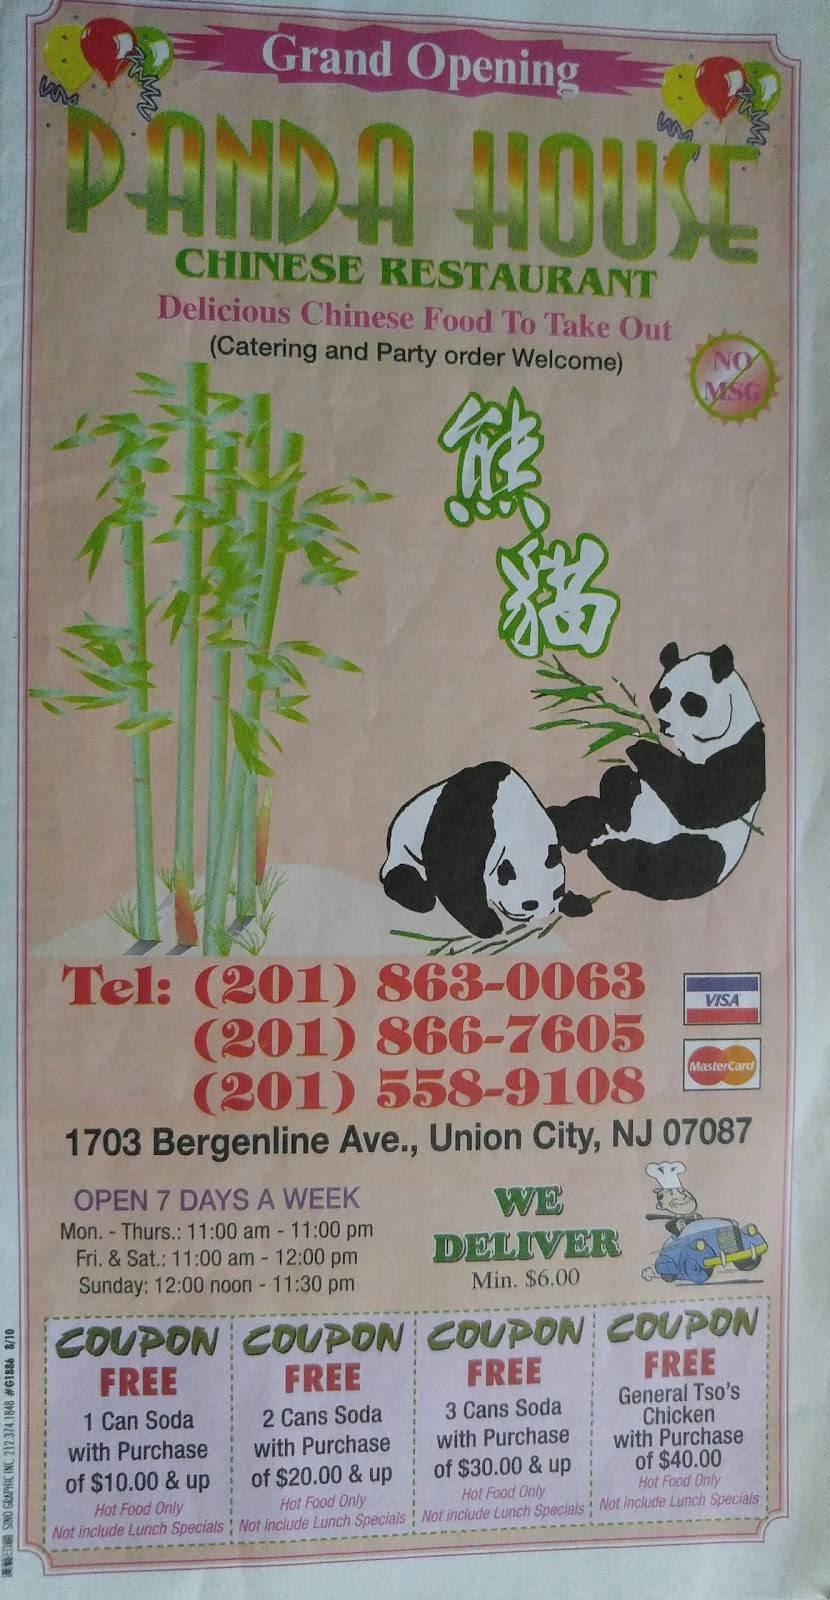 New Panda House   restaurant   1703 Bergenline Ave, Union City, NJ 07087, USA   2018630063 OR +1 201-863-0063